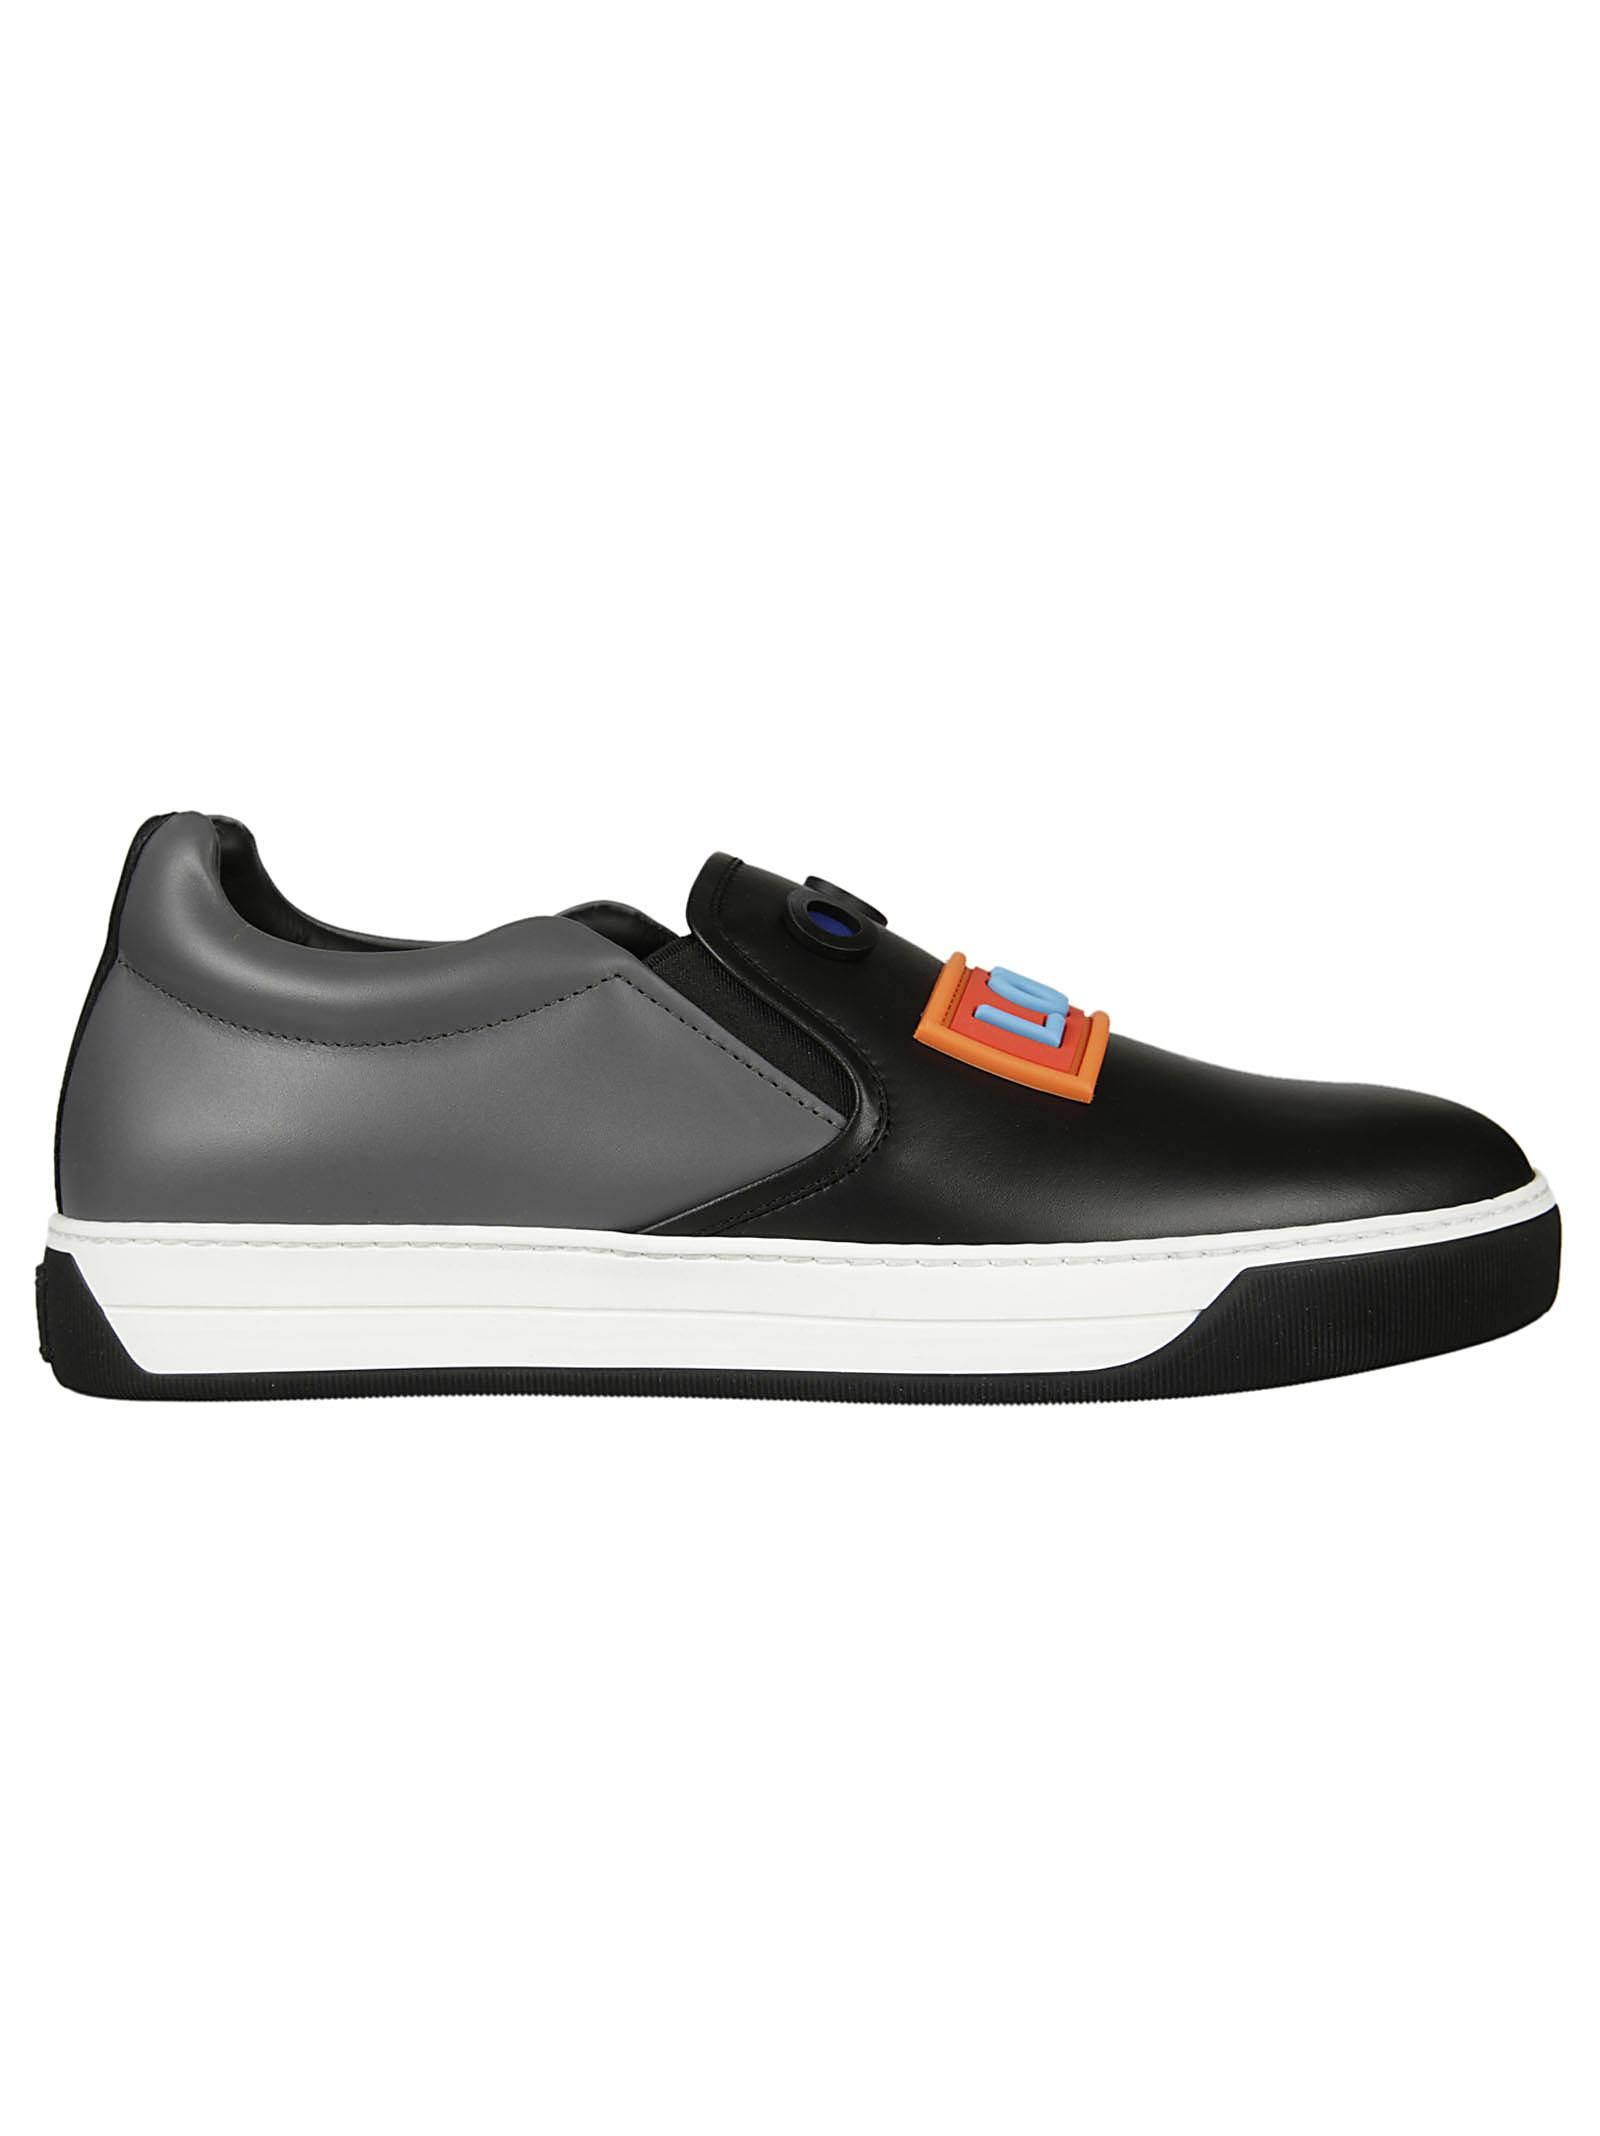 Fendi Love Sneakers